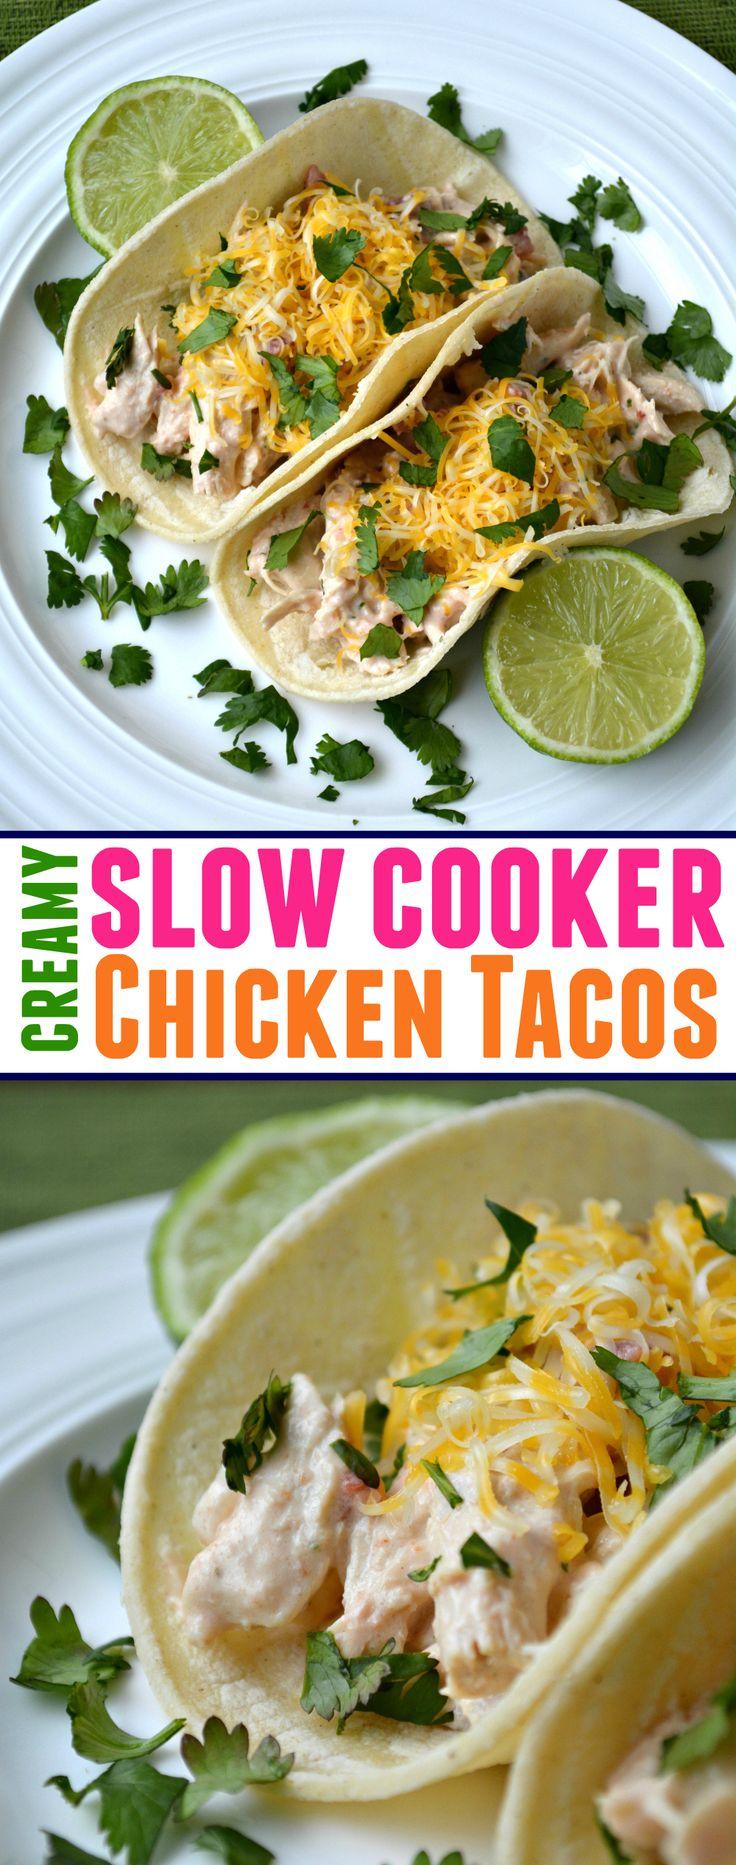 Chicken taco recipe in spanish